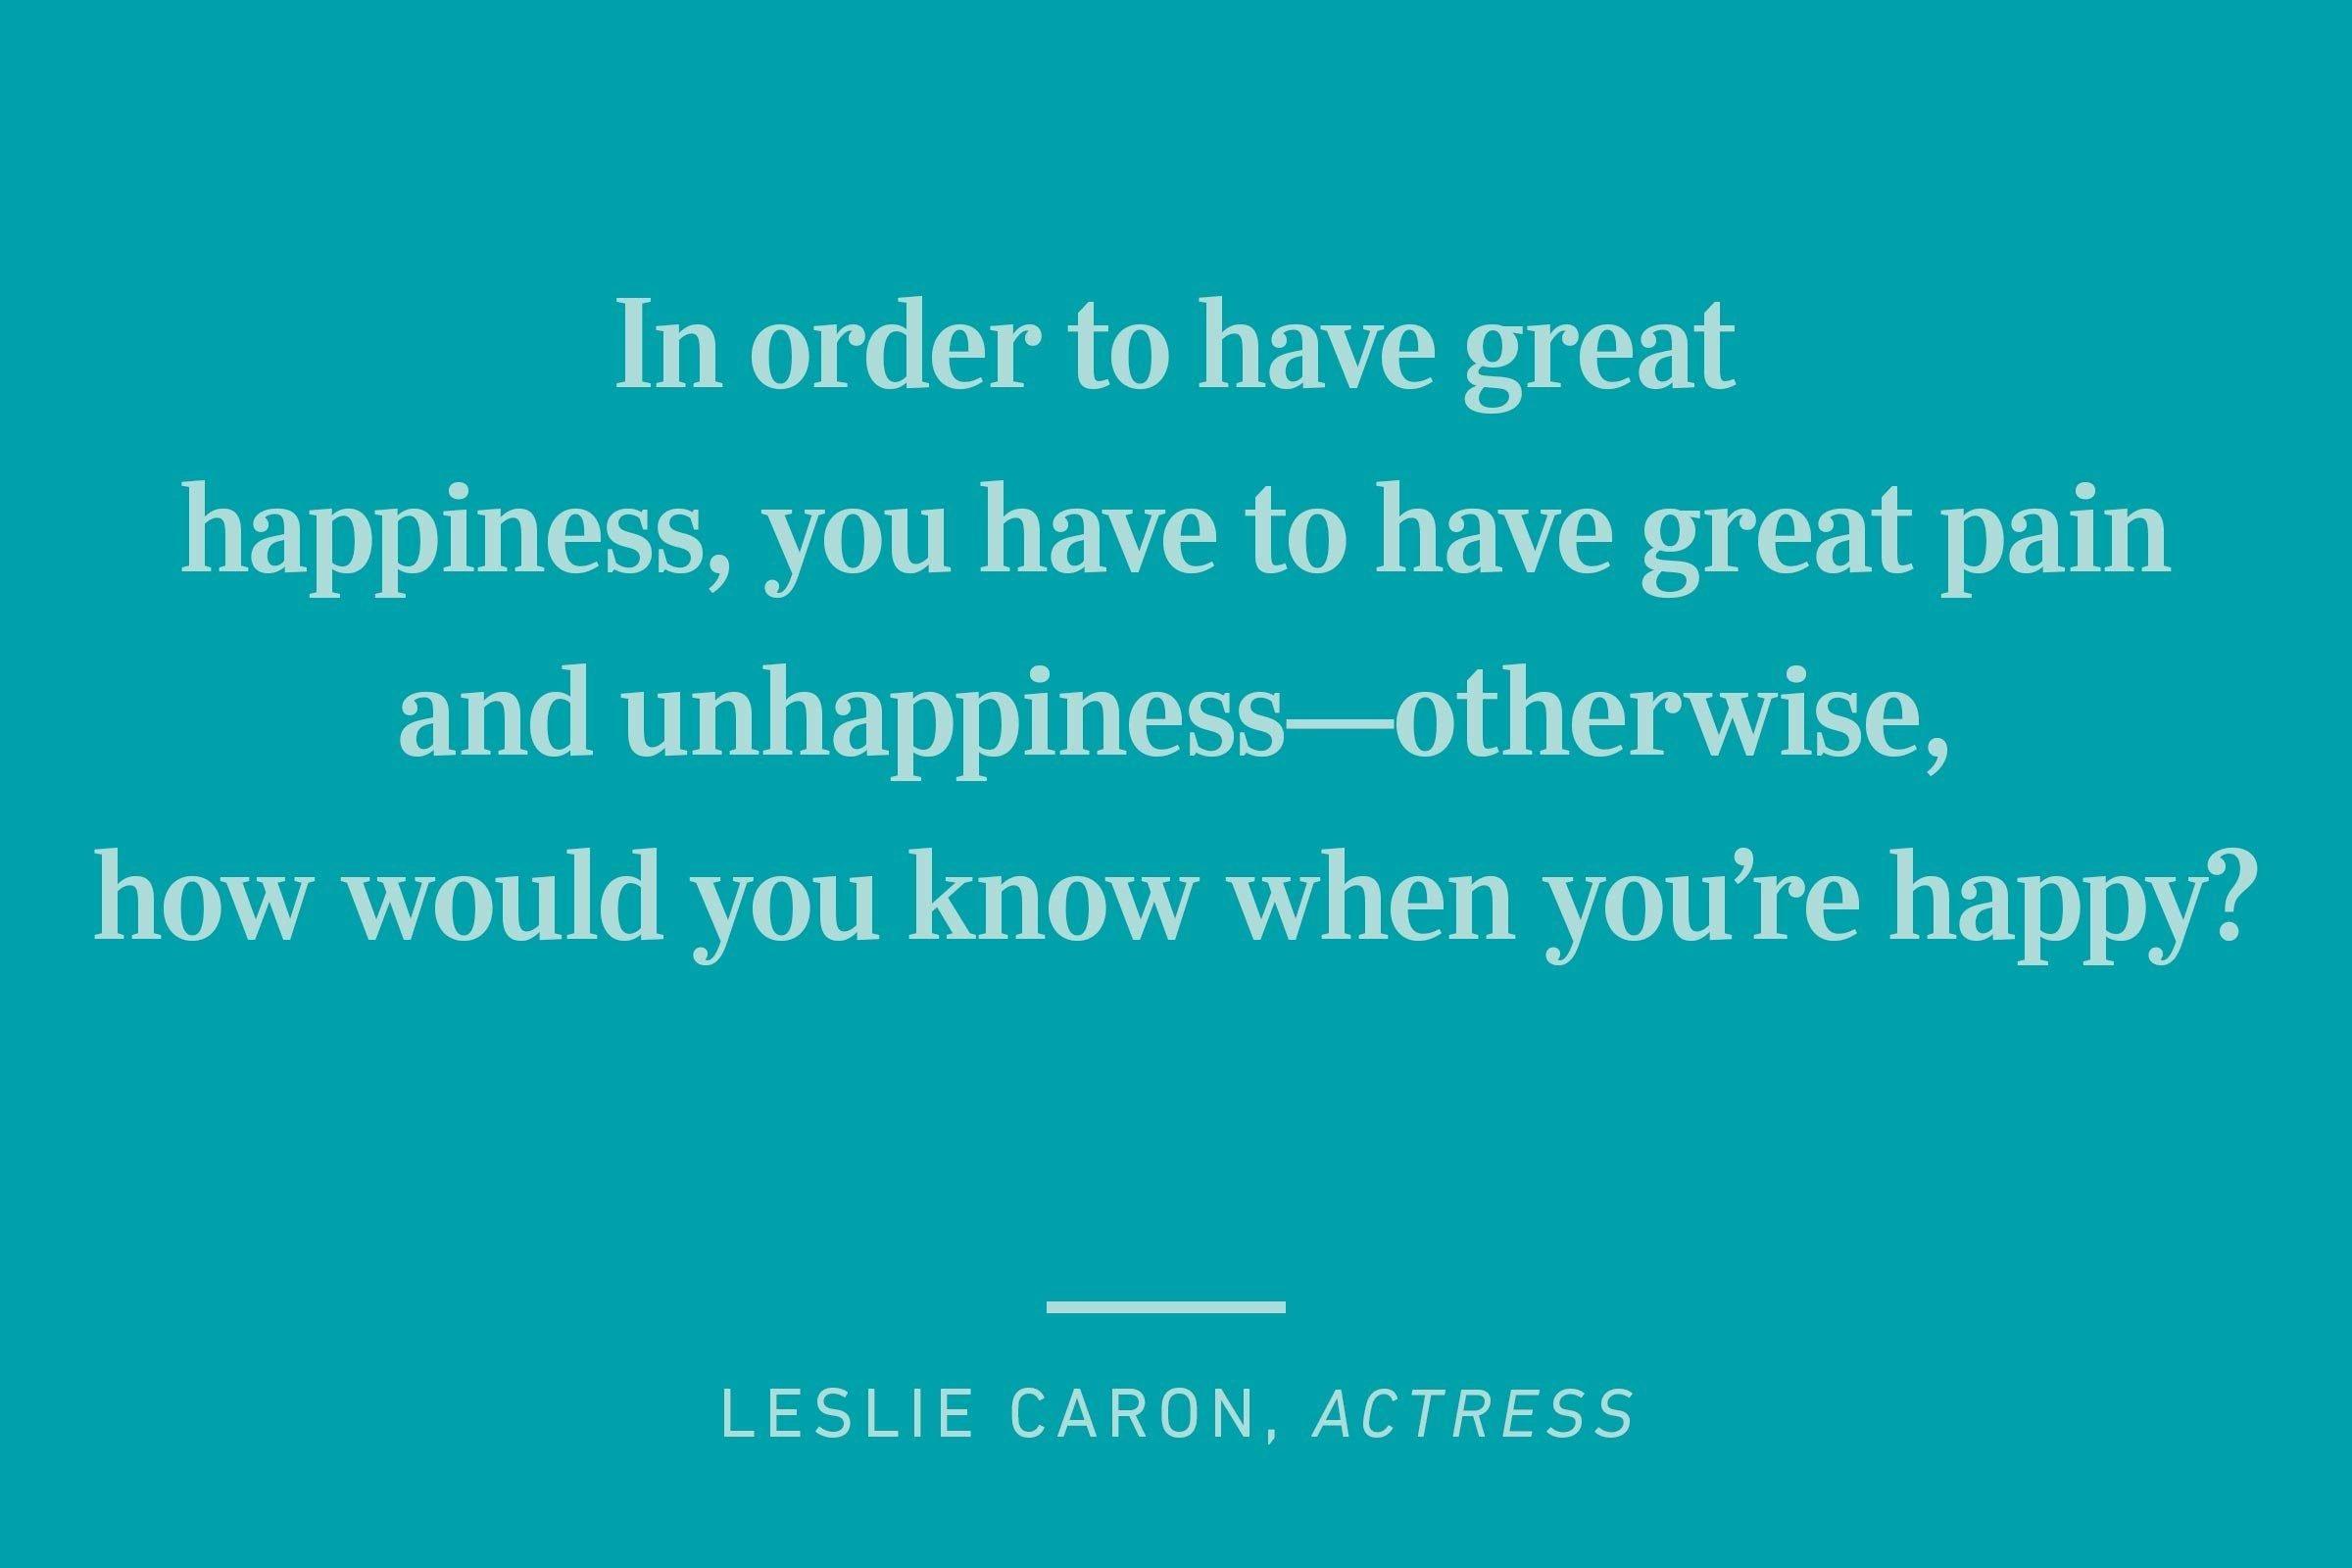 leslie caron happiness quote